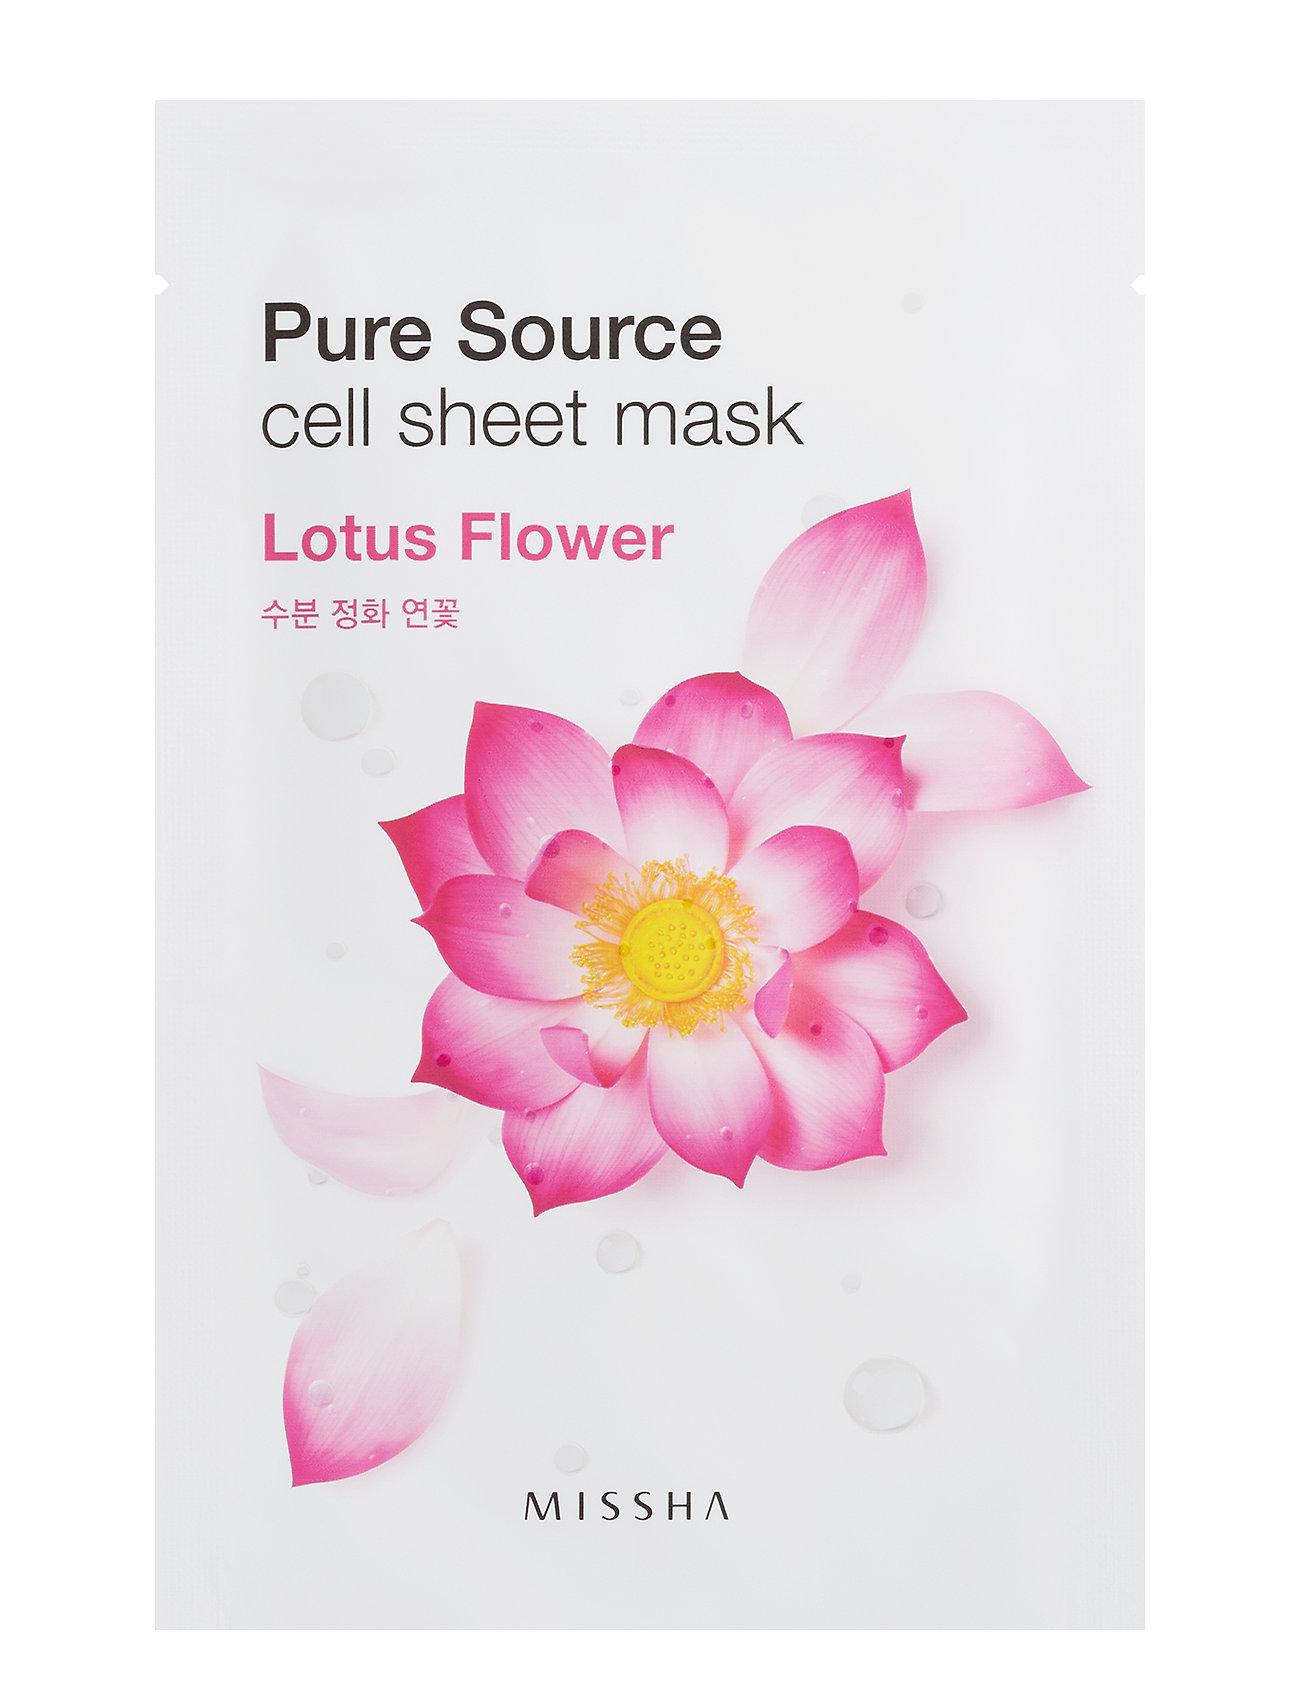 Missha Pure Source Cell Sheet Mask (Lotus) - Missha